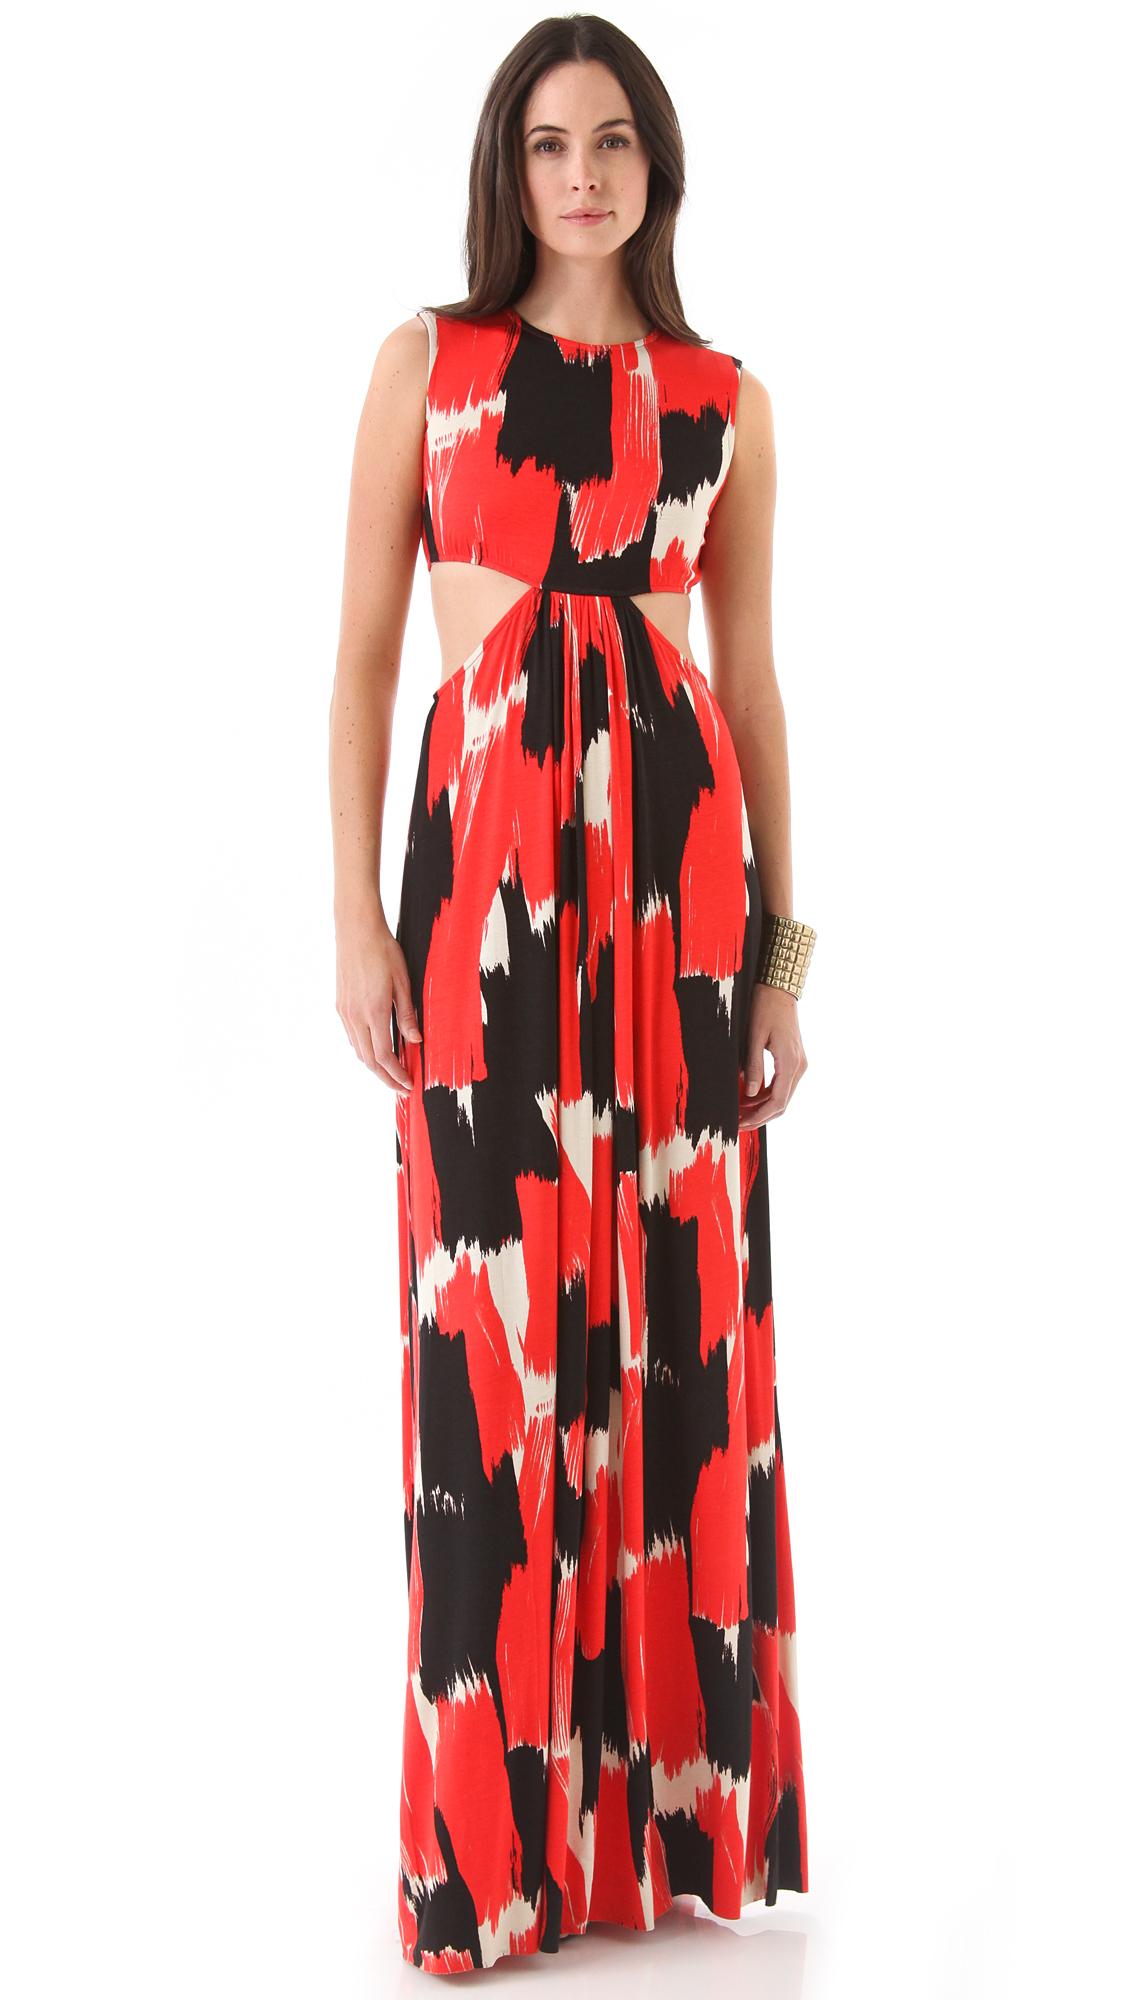 Rachel Pally Hope Print Cutout Maxi Dress on PopScreen 7400dba4c